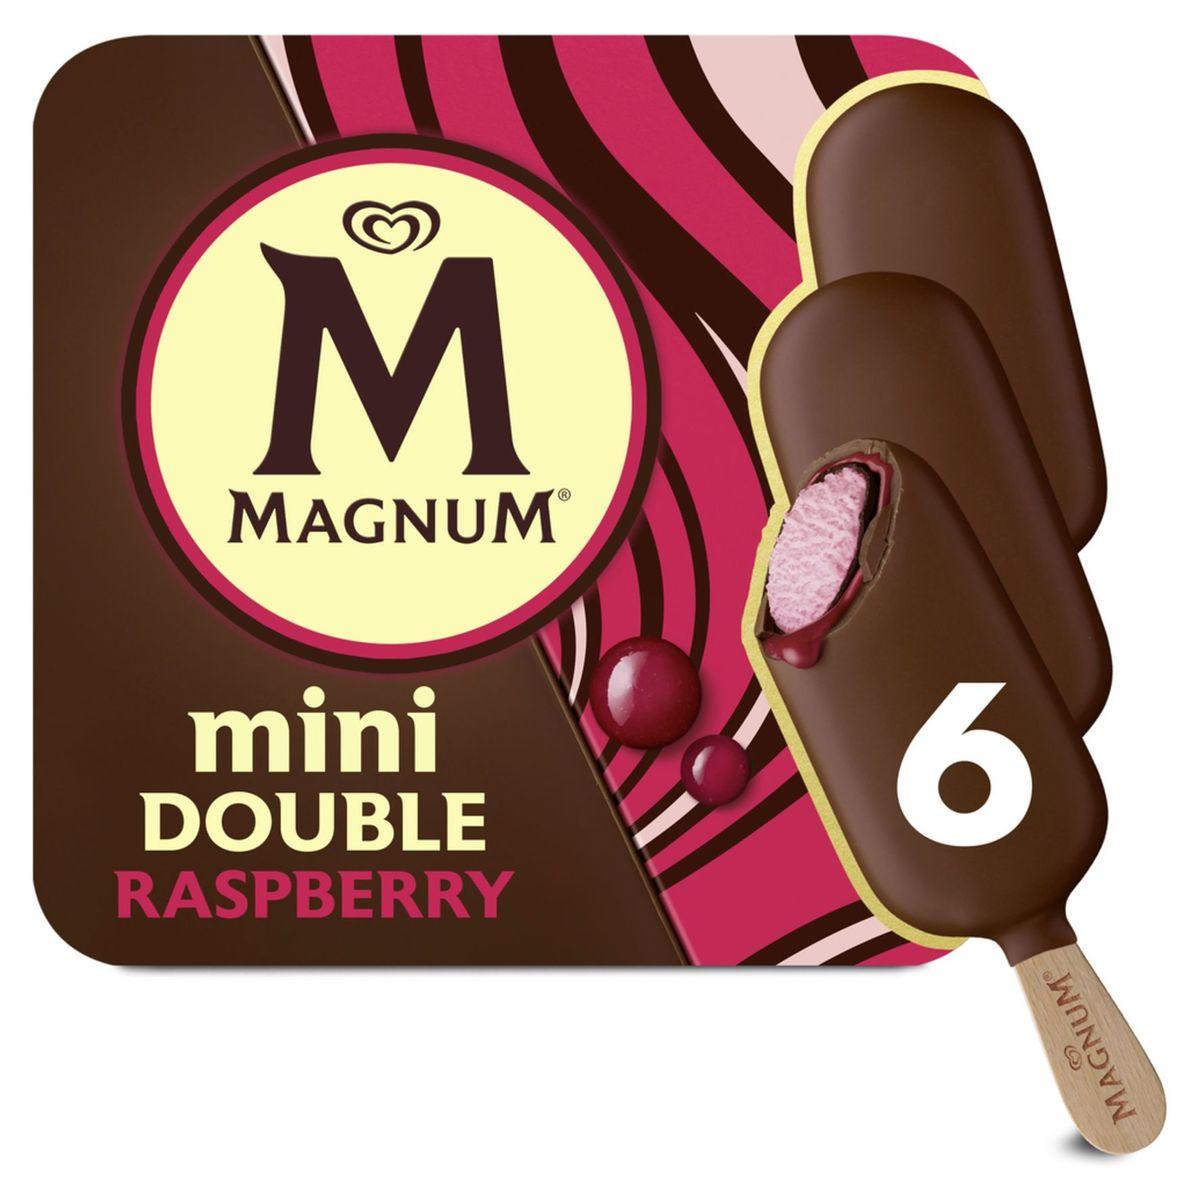 Magnum Ola Ijs Mulitpack Mini Double Raspberry 6 x 60 ml